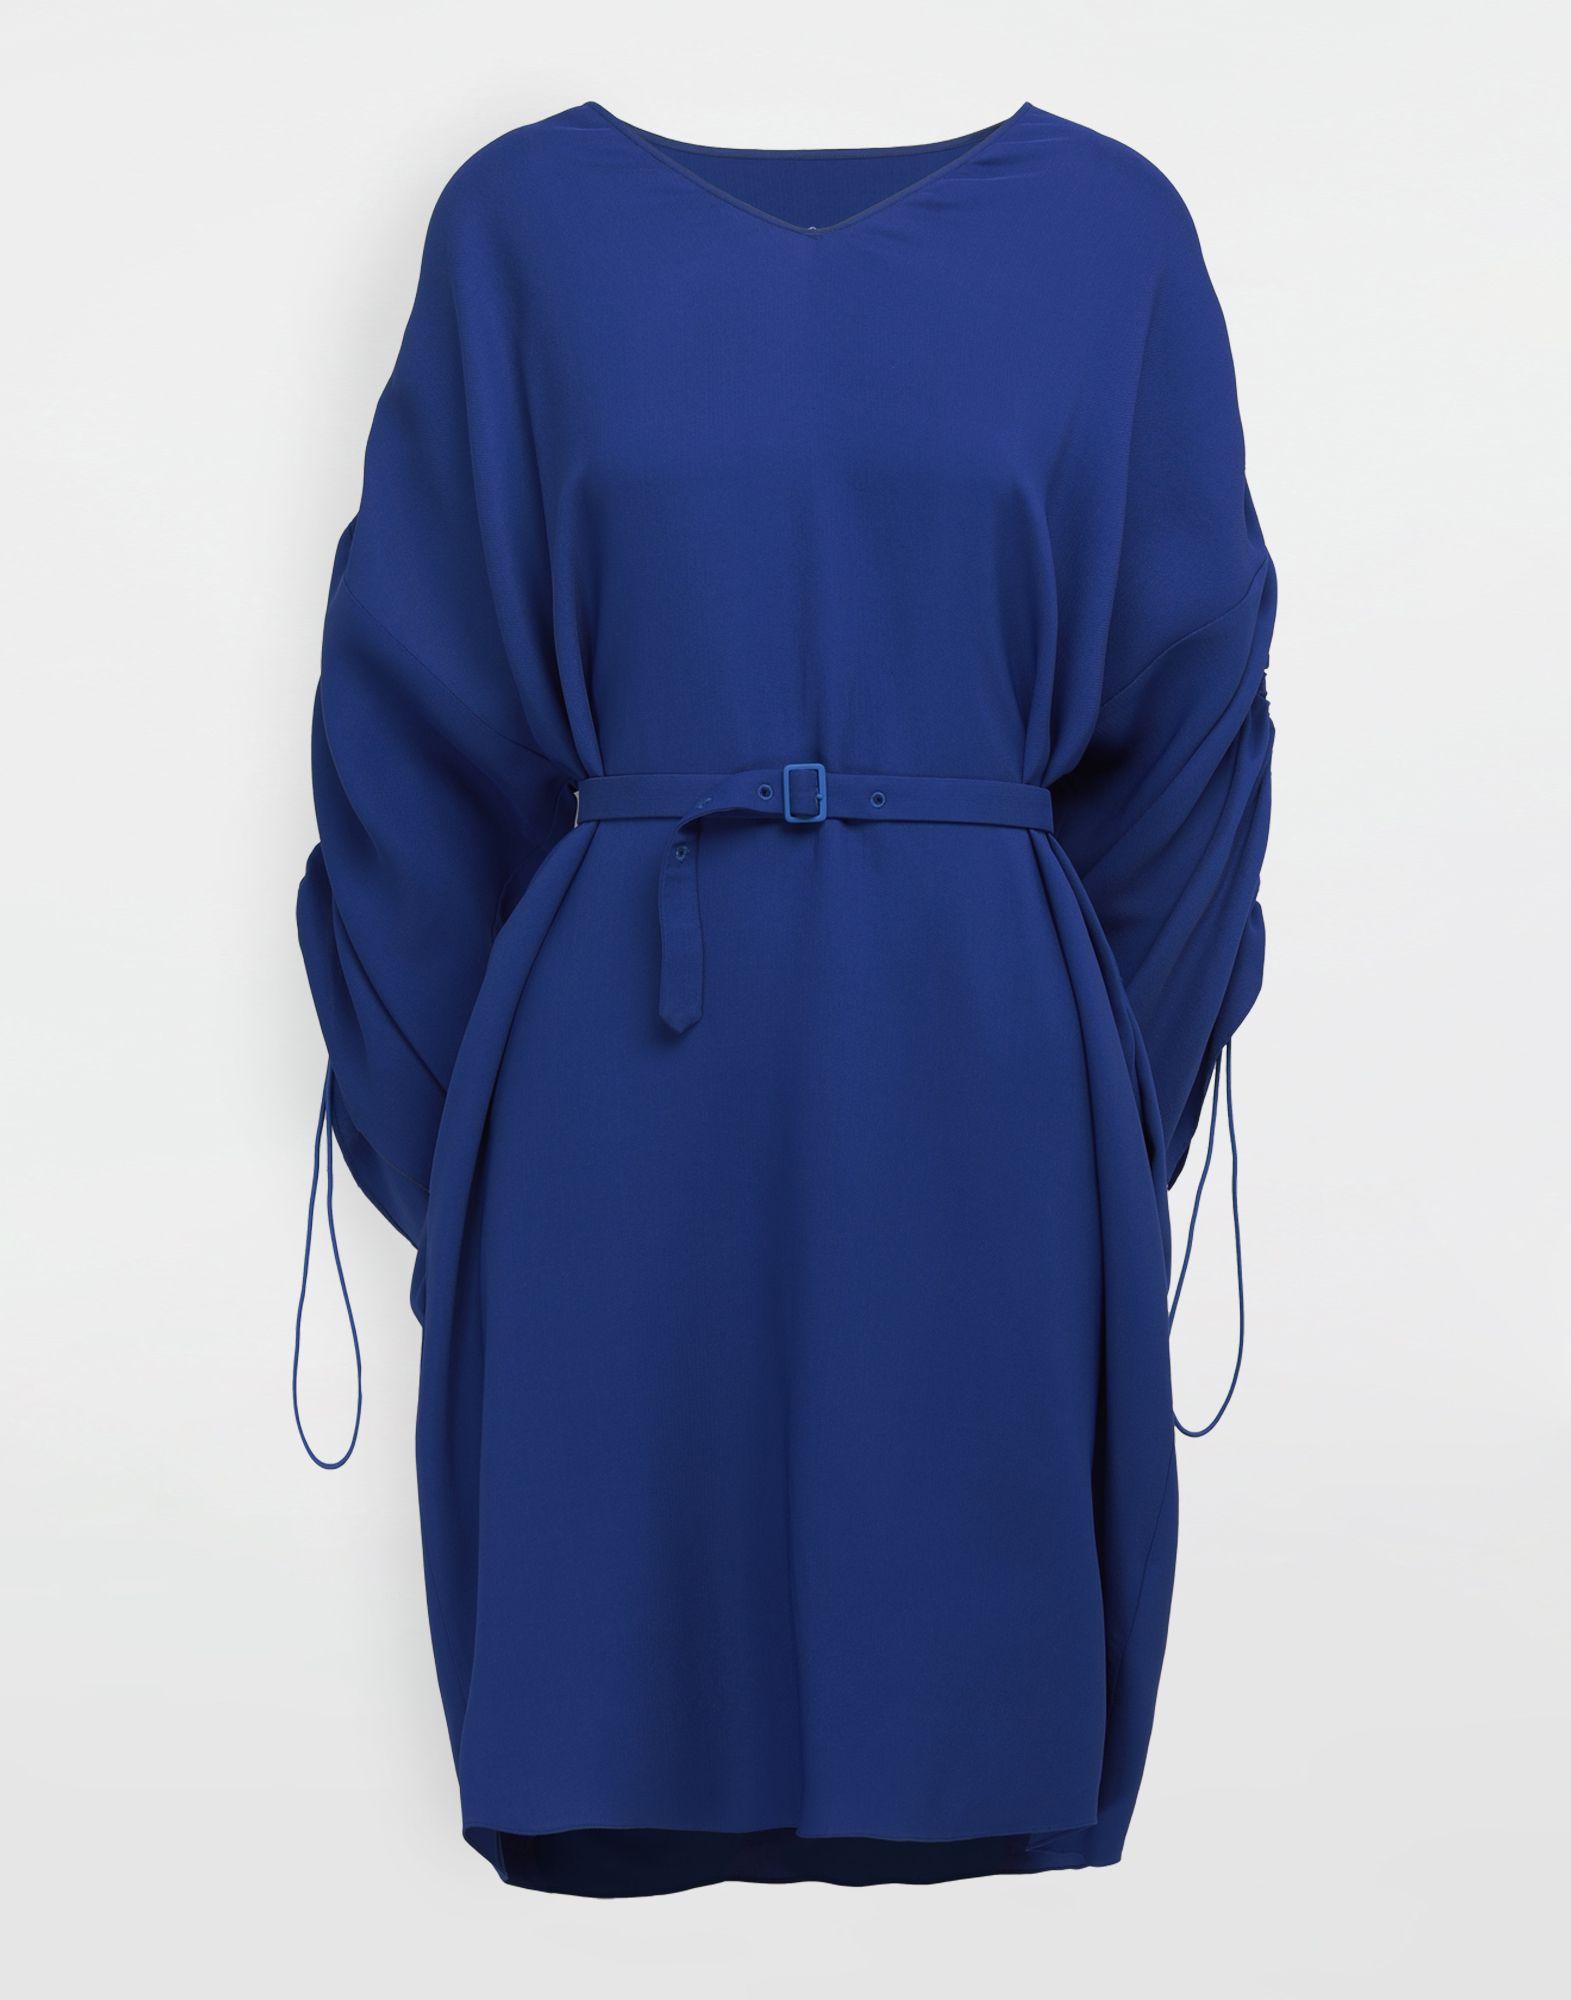 MAISON MARGIELA Ruched-sleeve jersey midi dress 3/4 length dress Woman f